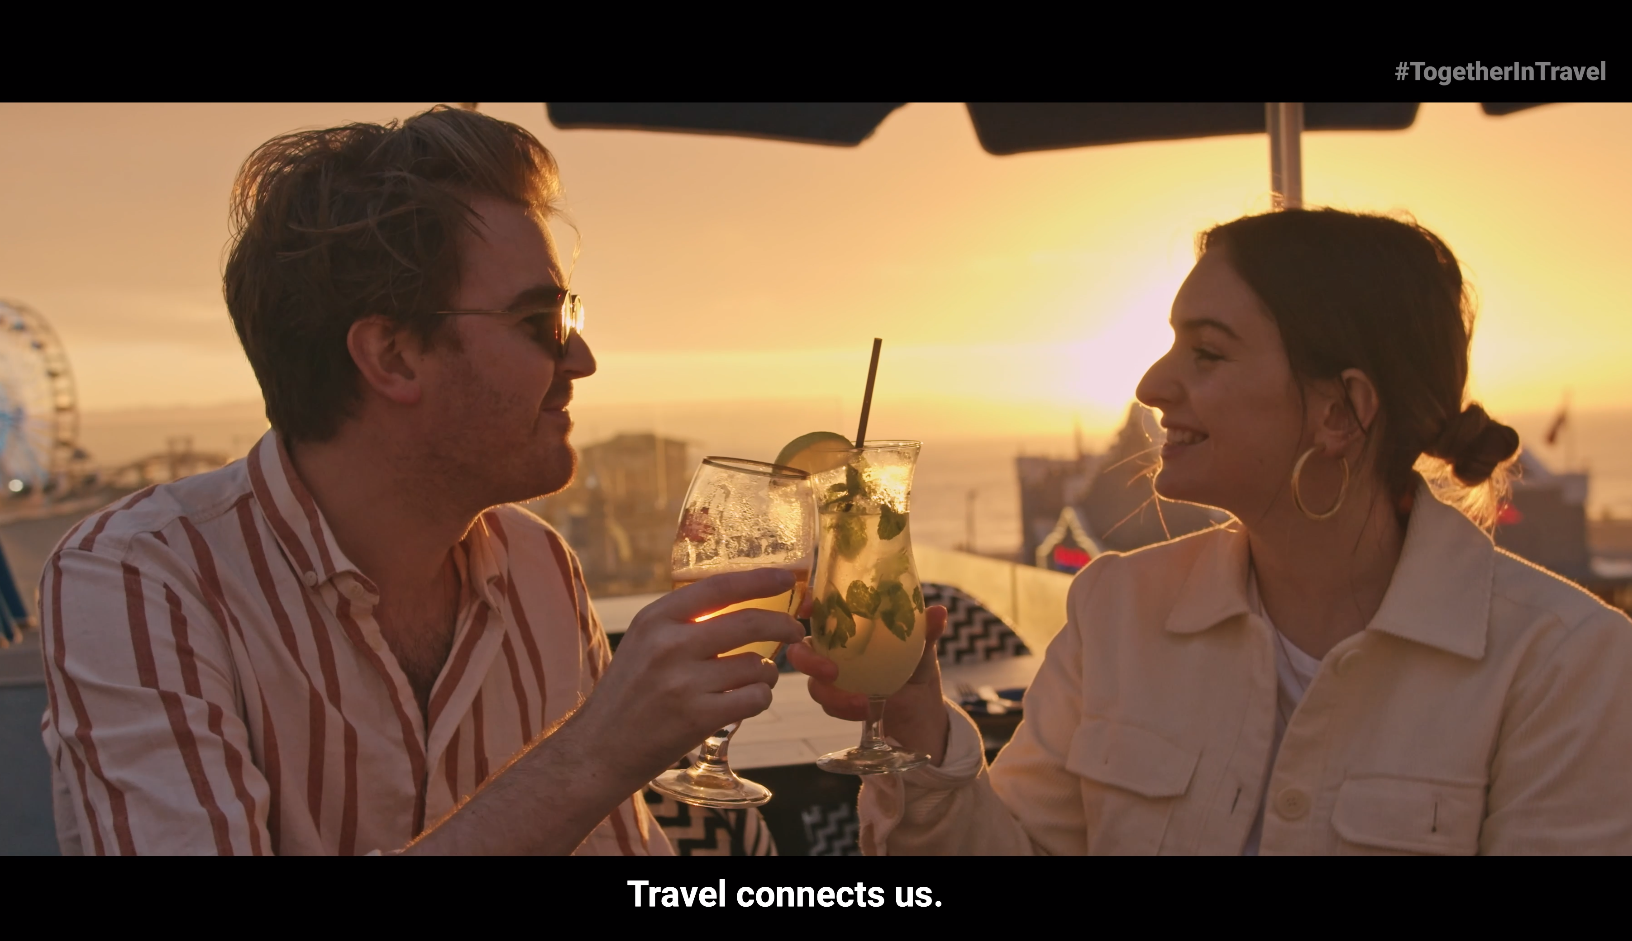 World Travel & Tourism Council lanceert #TogetherInTravel